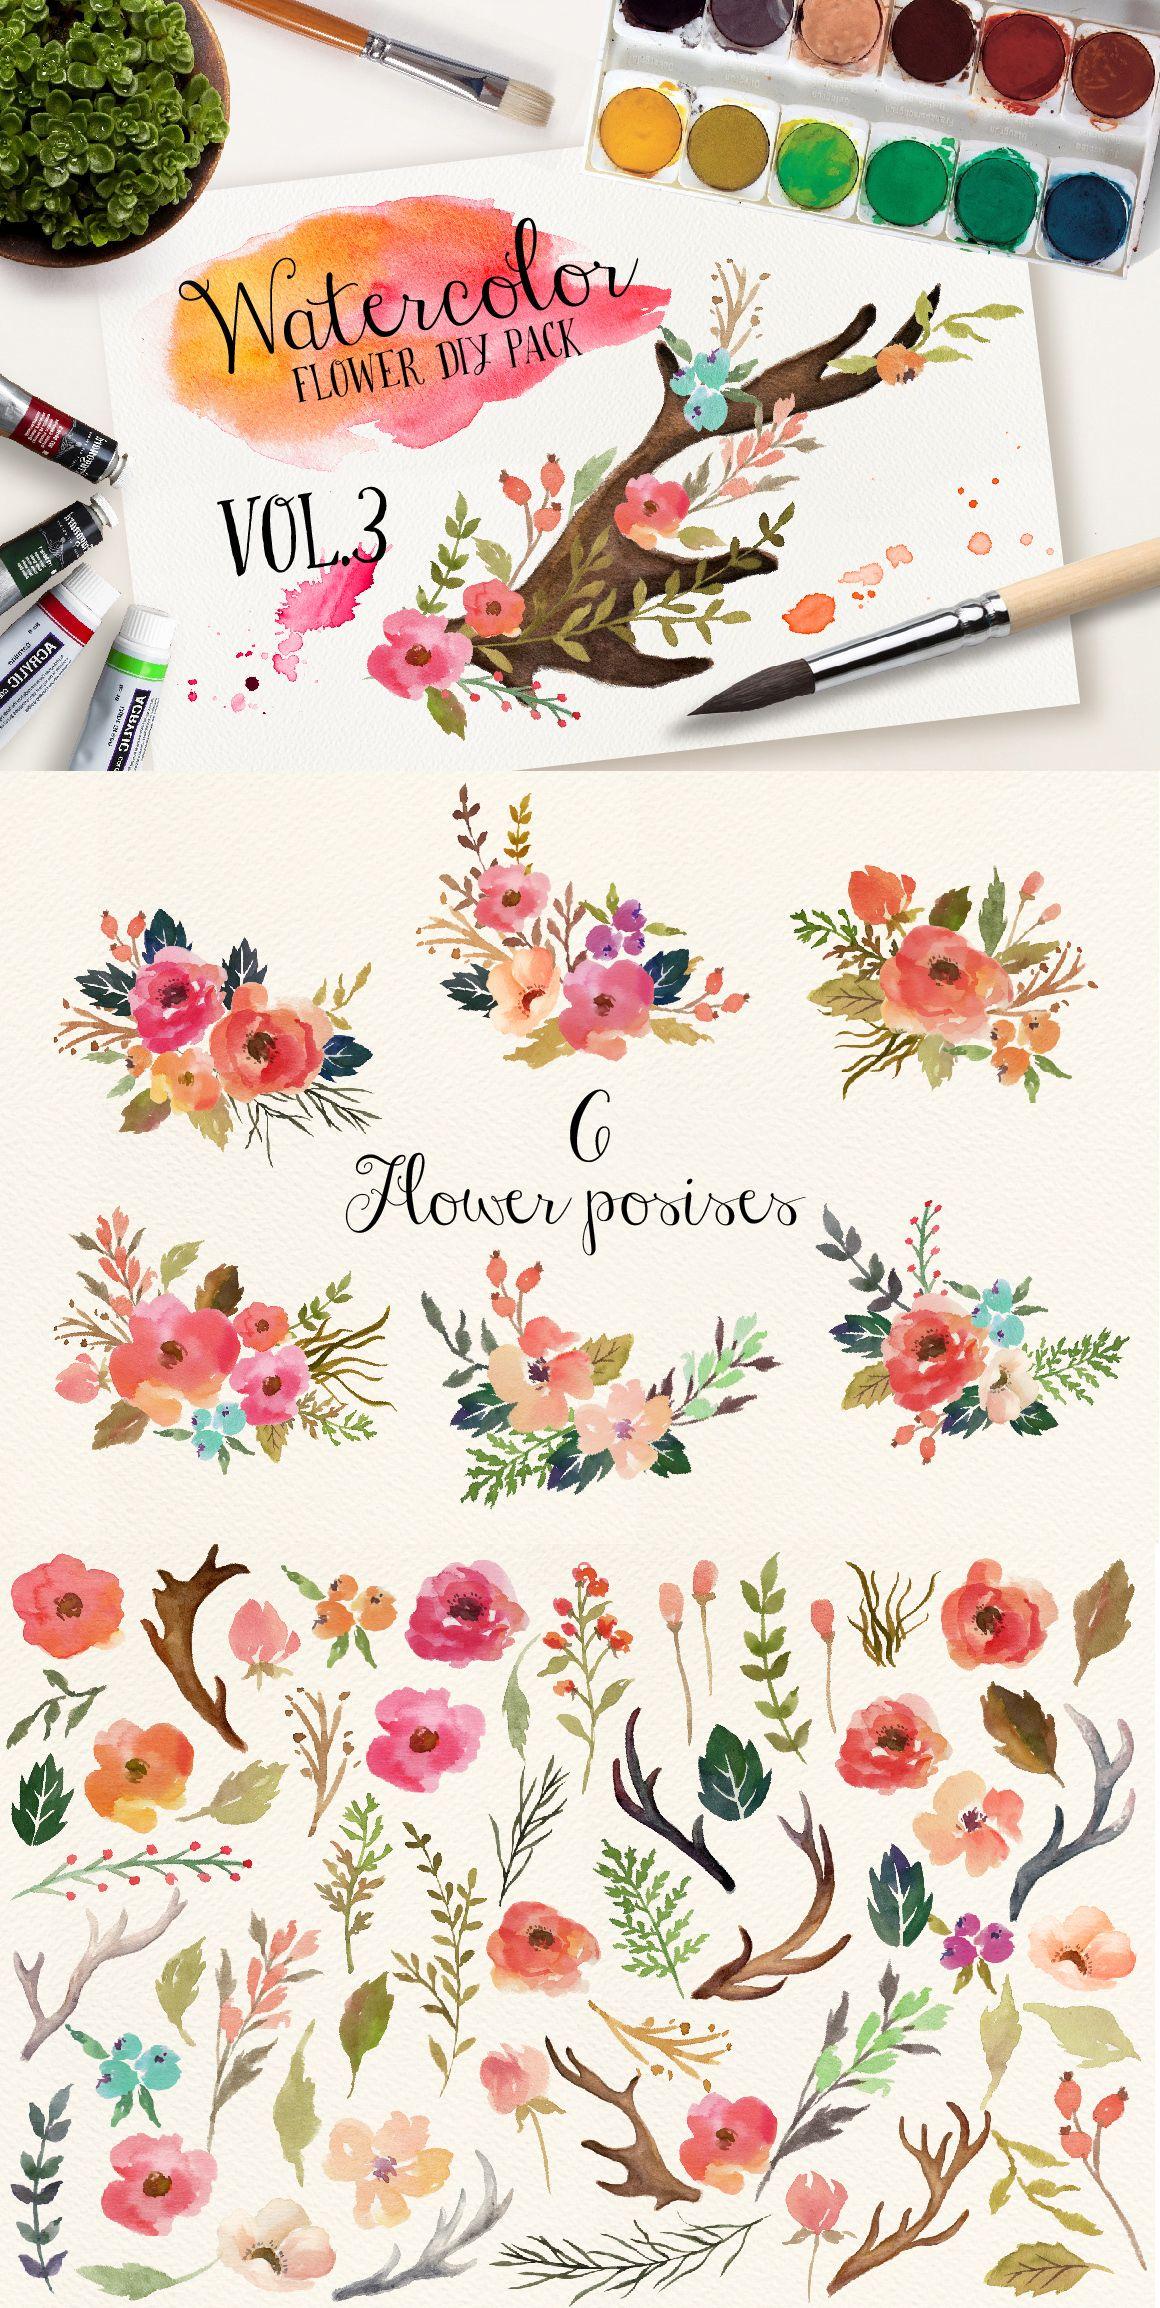 Watercolor flower diy pack vol flower diy watercolor and creative